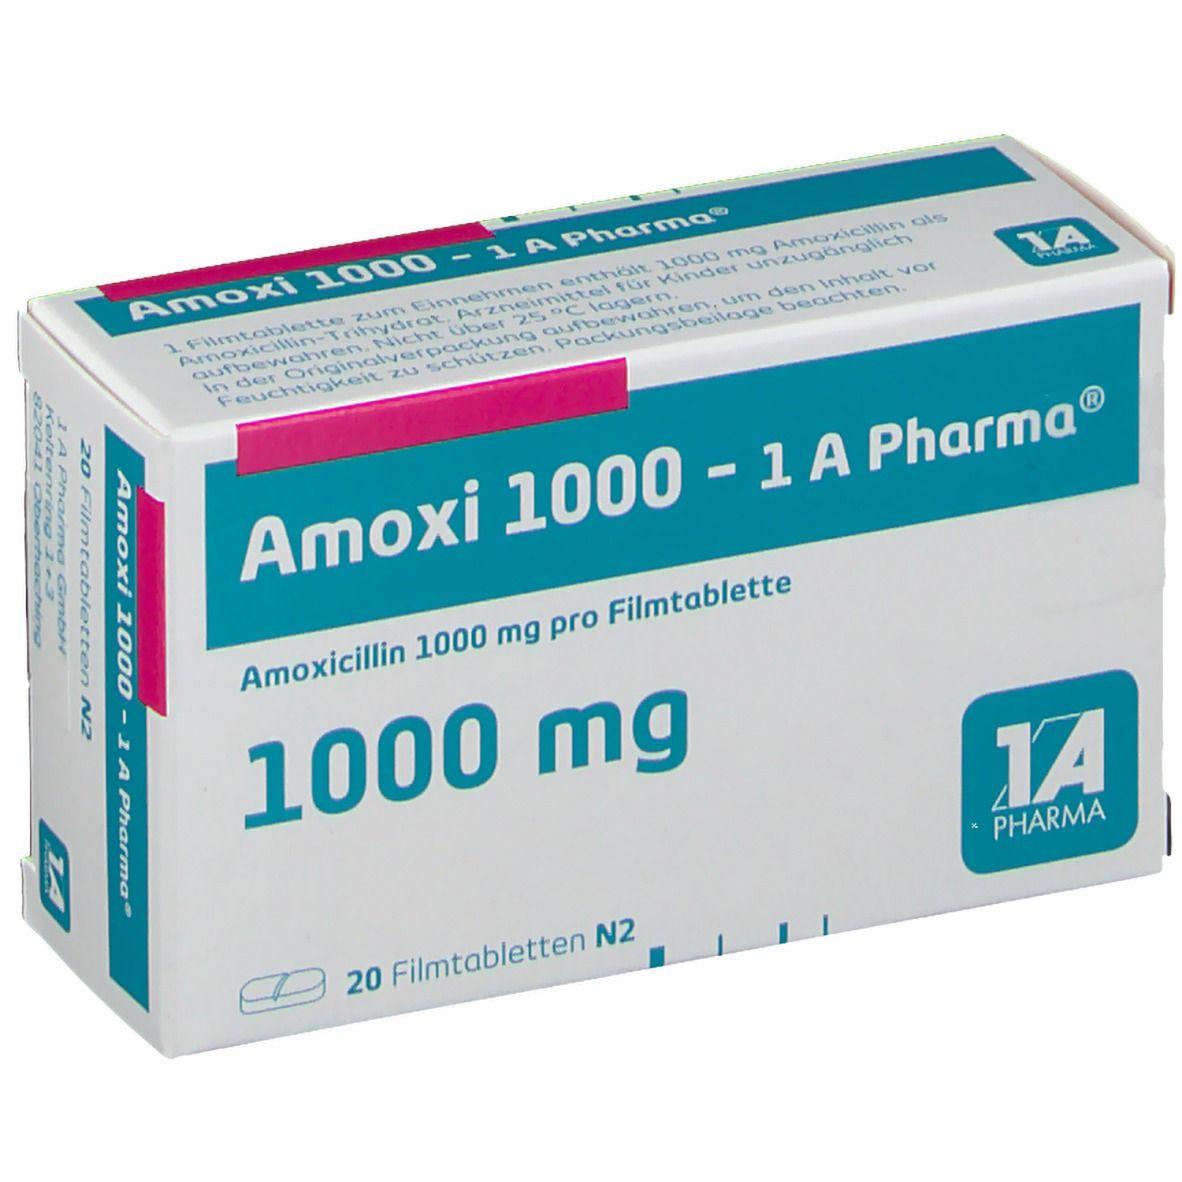 Amoxicillin und paracetamol antibiotika Mag ik